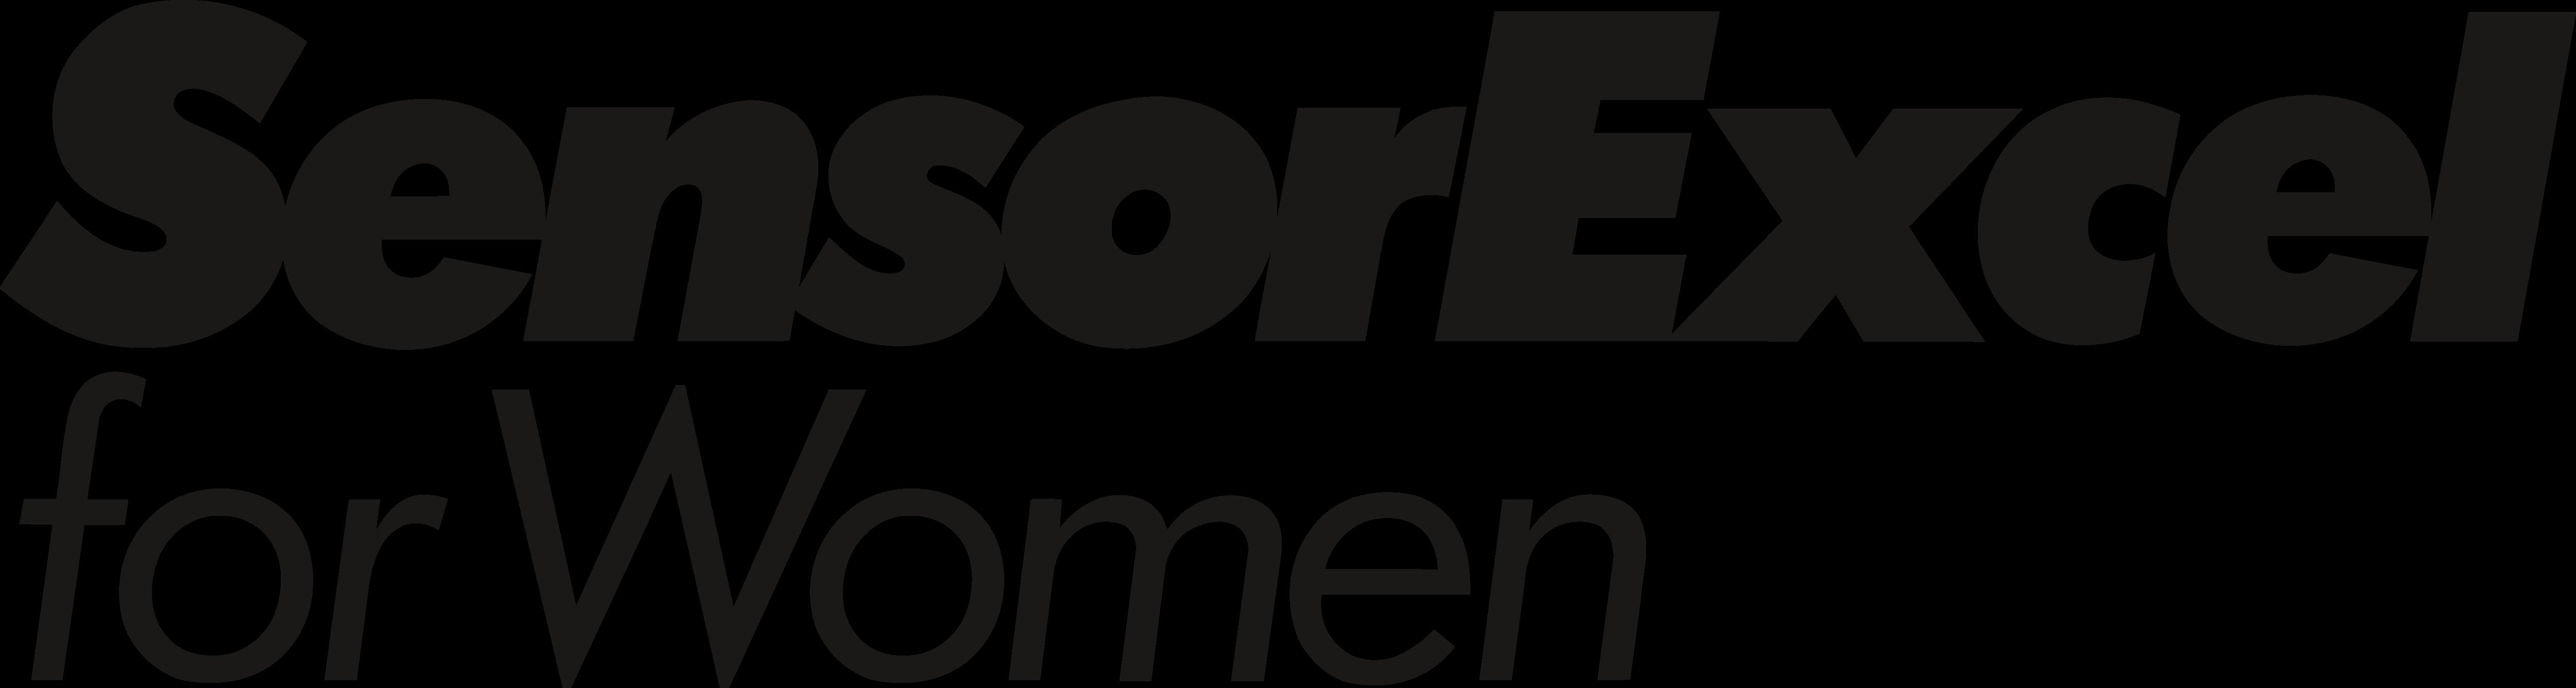 Gillette Sensorexcel For Women Logos Download